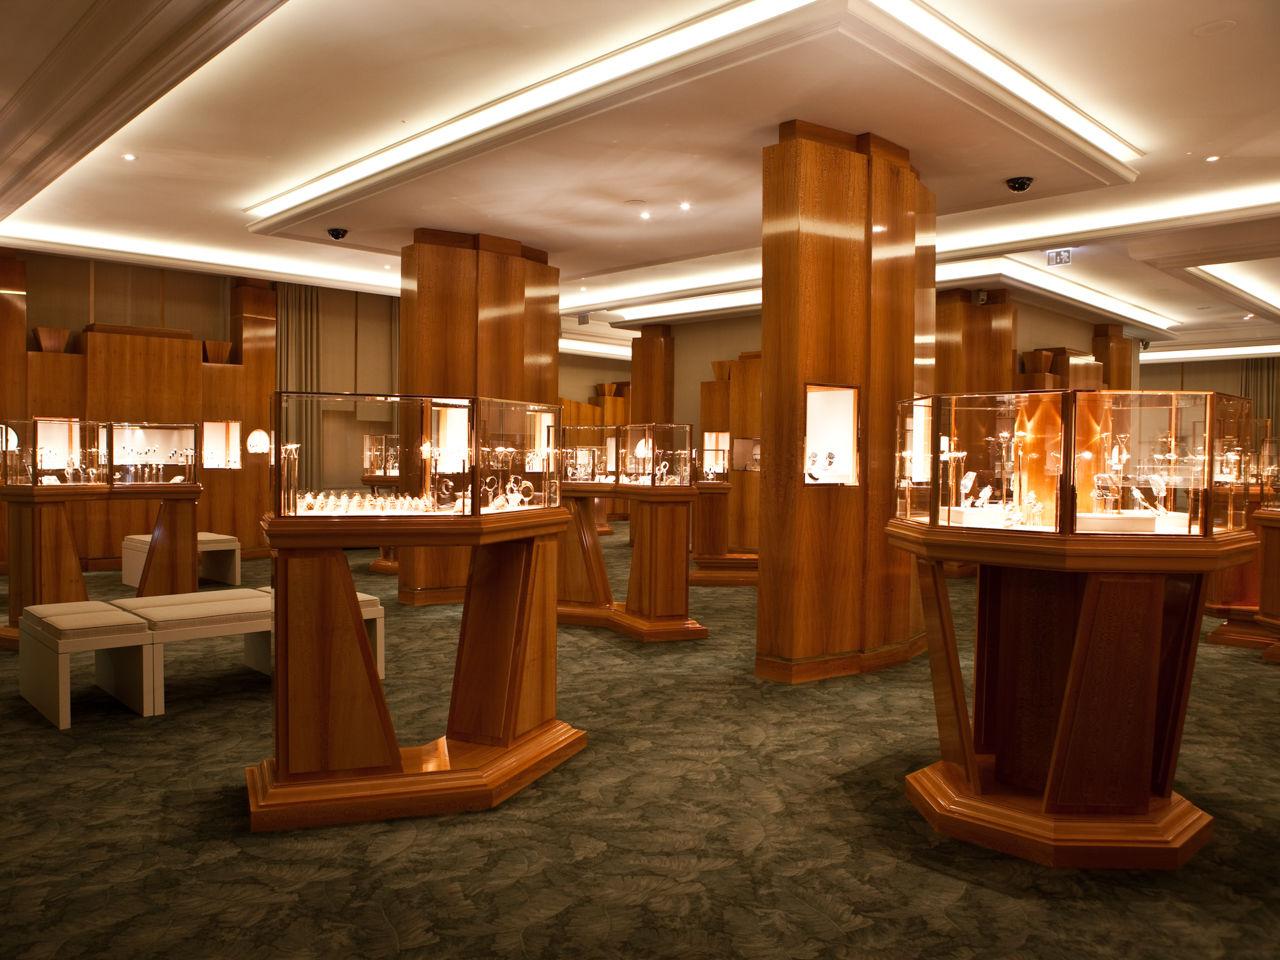 Resultado de imagen de Ginebra museo de patek philippe